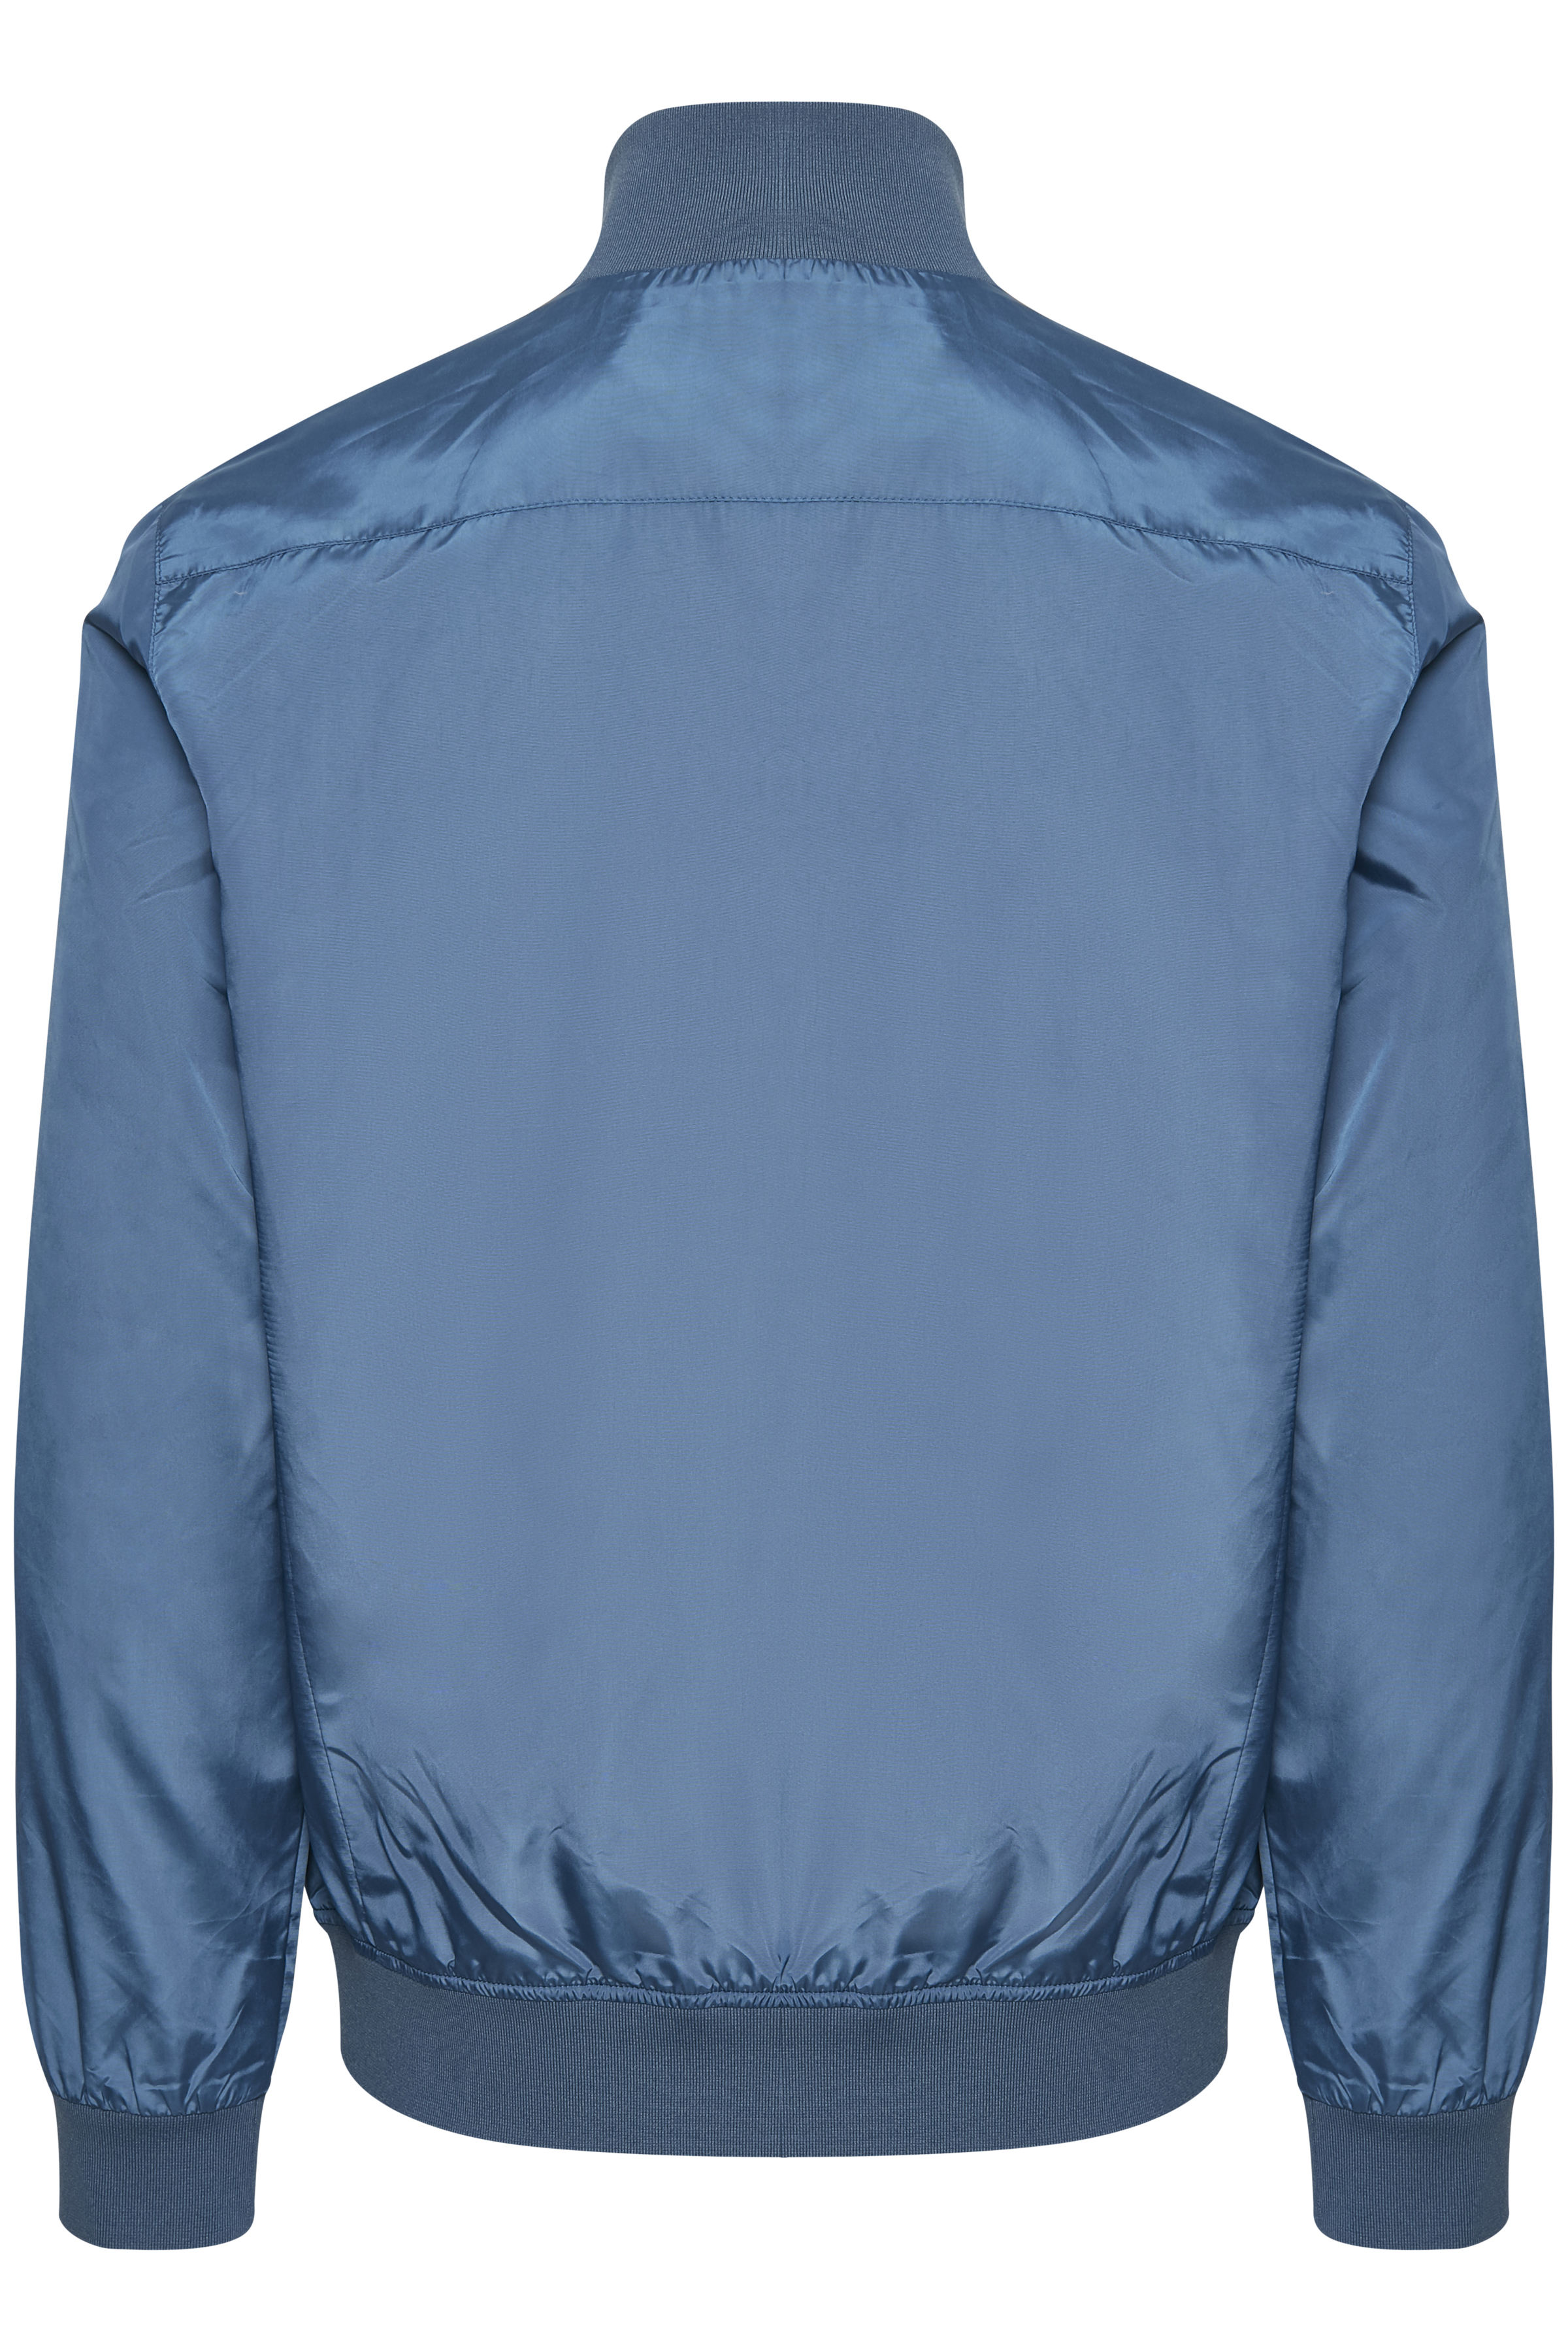 Dust Blue Hardon Jacket – Køb Dust Blue Hardon Jacket fra str. S-XXL her